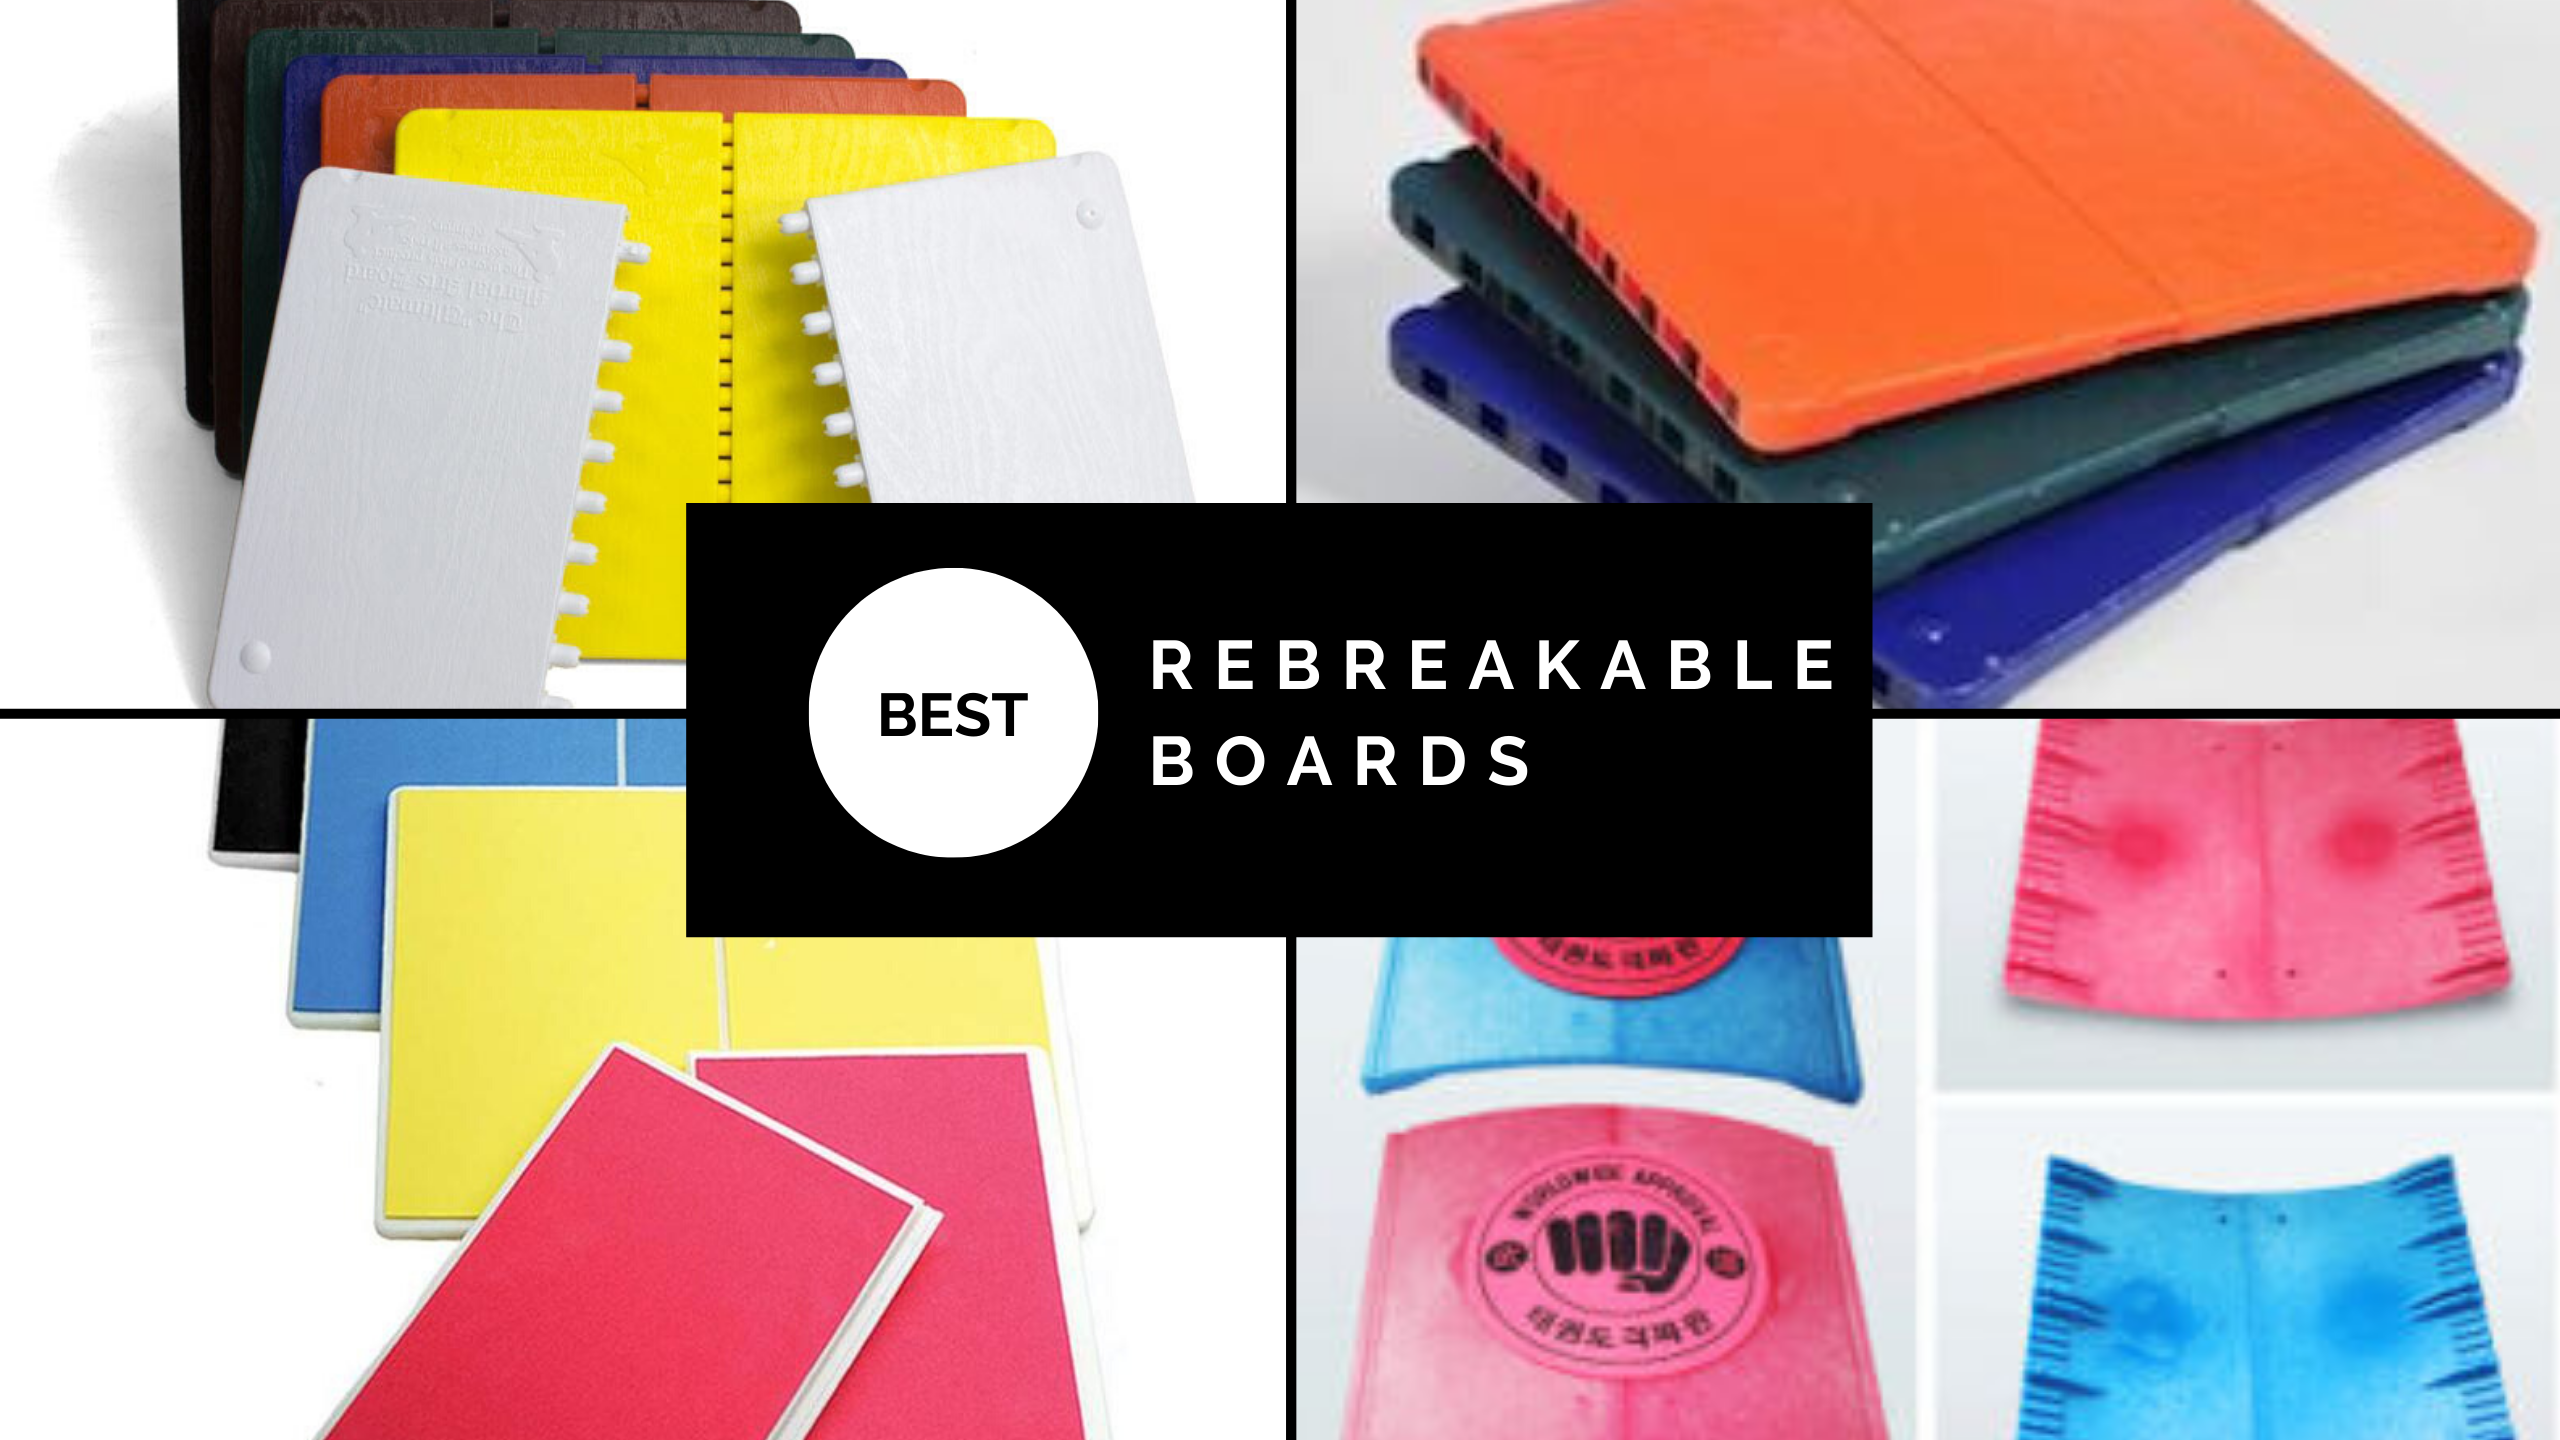 Best Rebreakable Boards